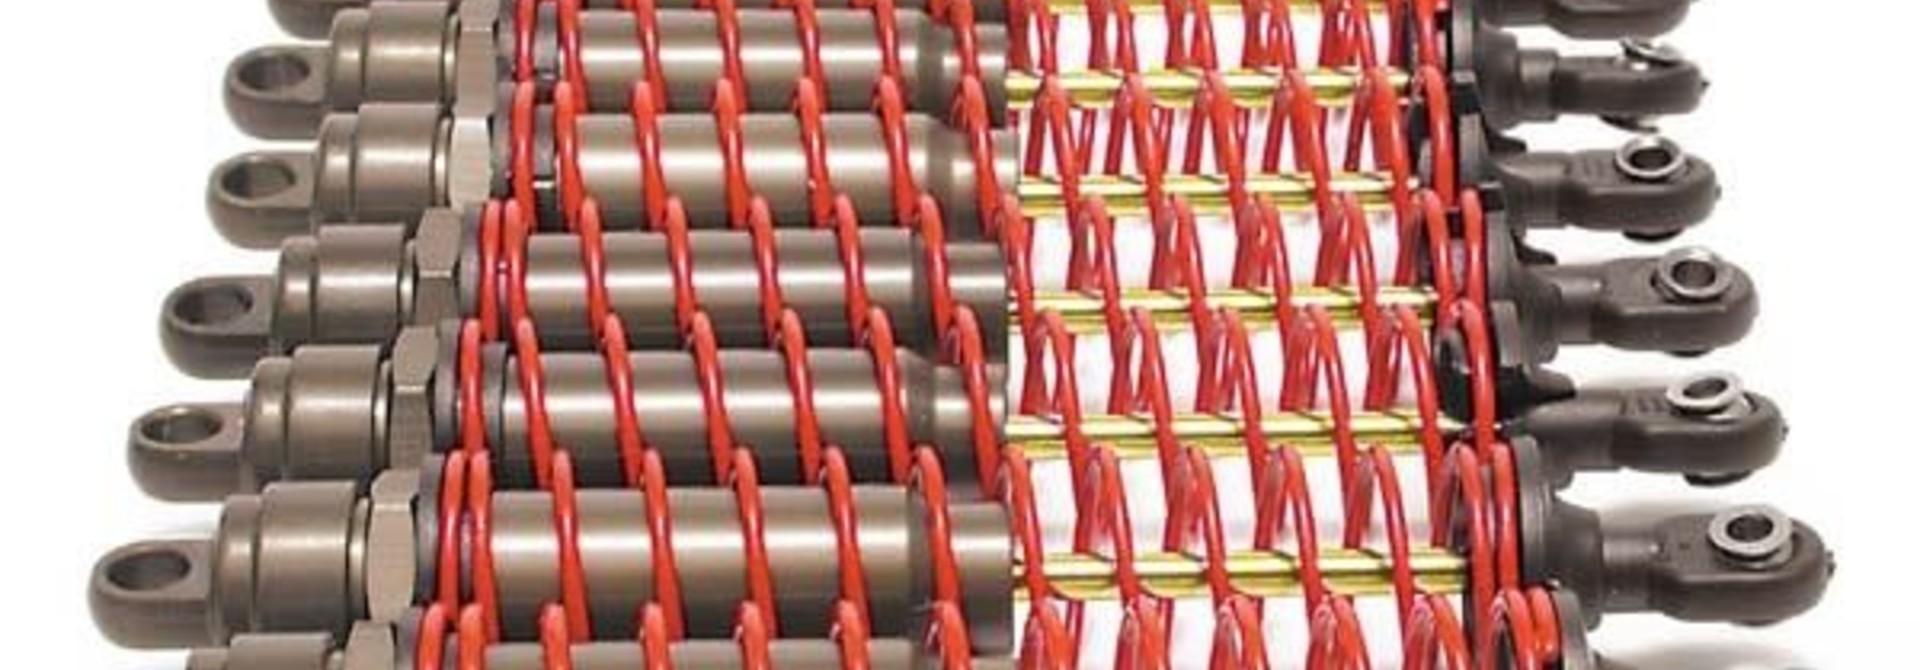 Big Bore shocks (xx-long) (hard-anodized & Teflon-coated T6, TRX4962